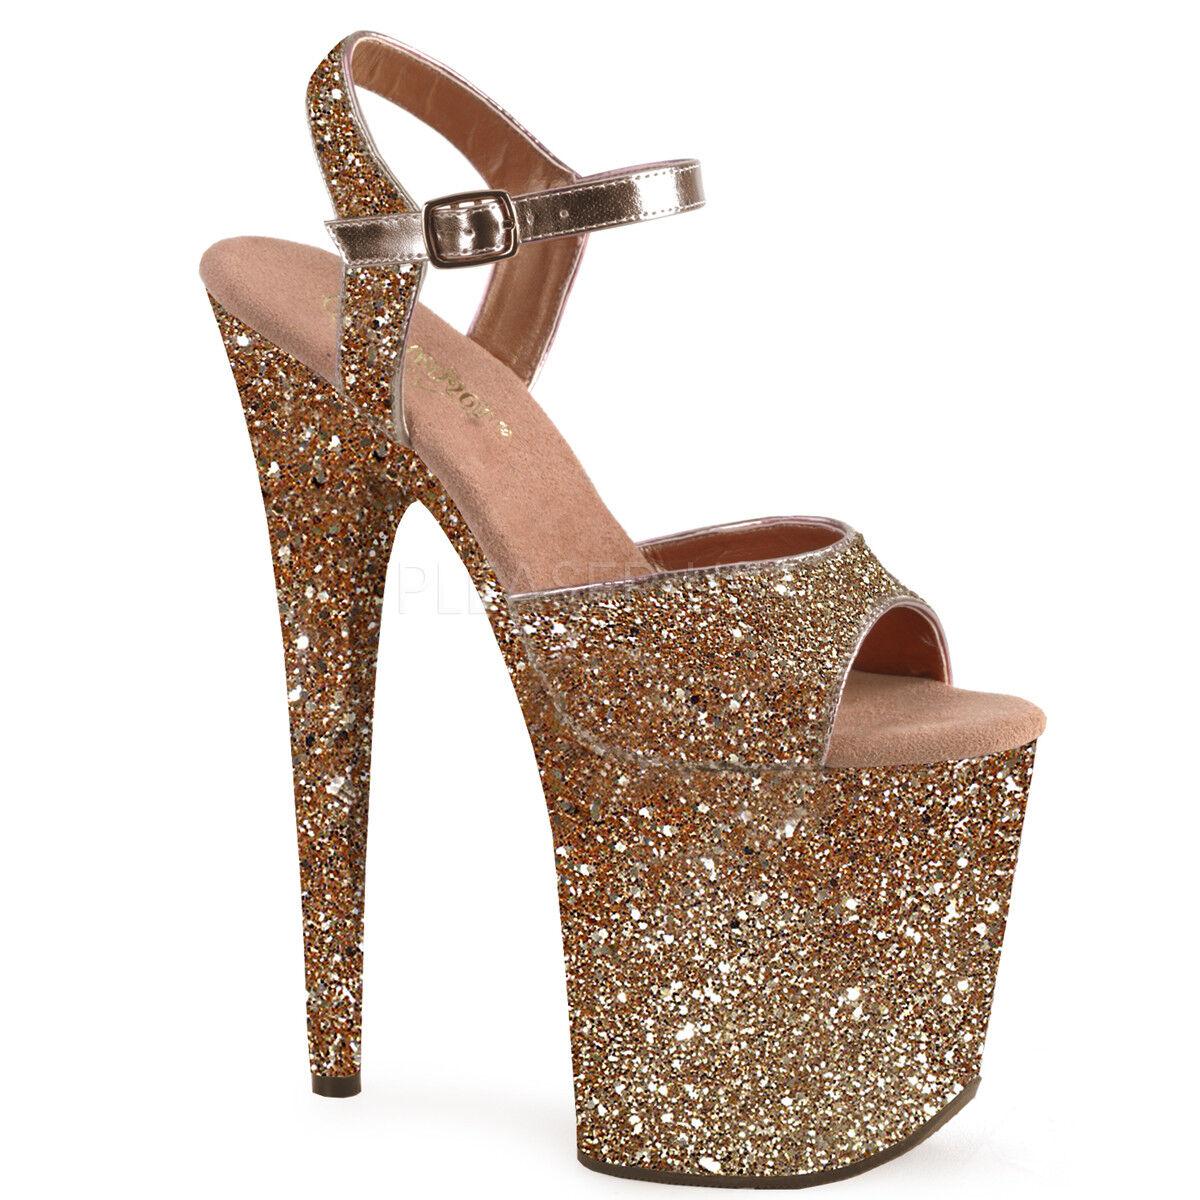 "PLEASER Sexy 8"" Heel Rose Gold Glitter Ankle Strap Stripper Platform Women Shoes"